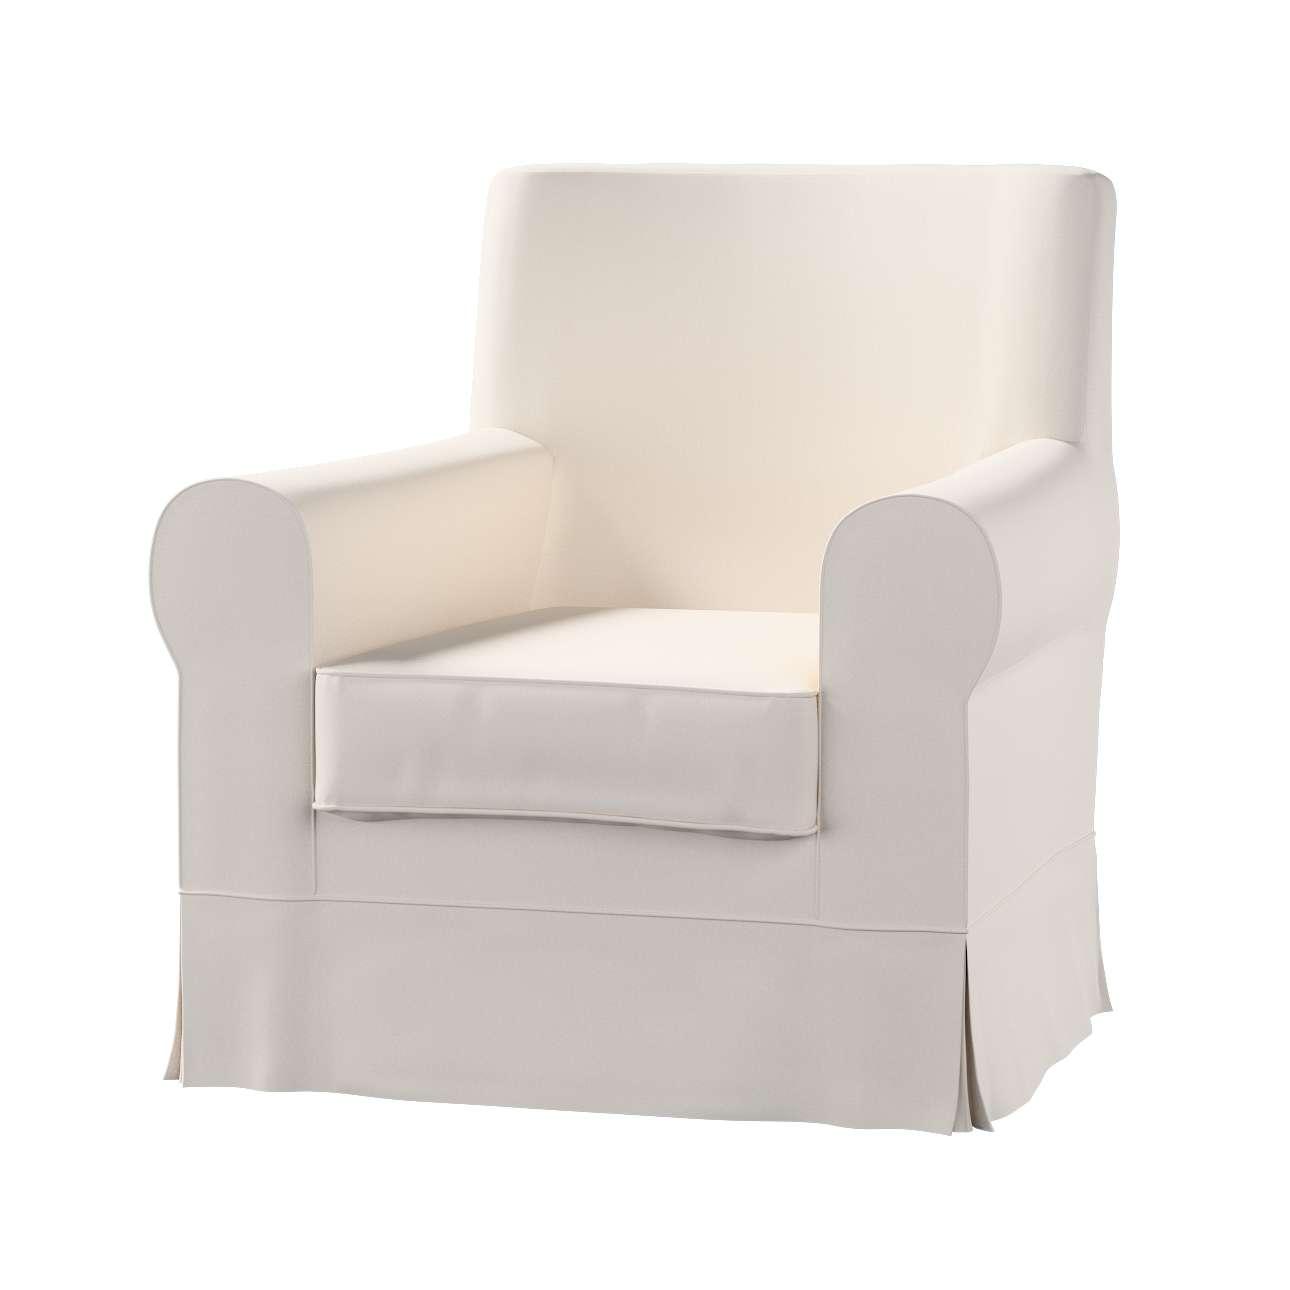 ikea sessel bezug fliesen 2017. Black Bedroom Furniture Sets. Home Design Ideas